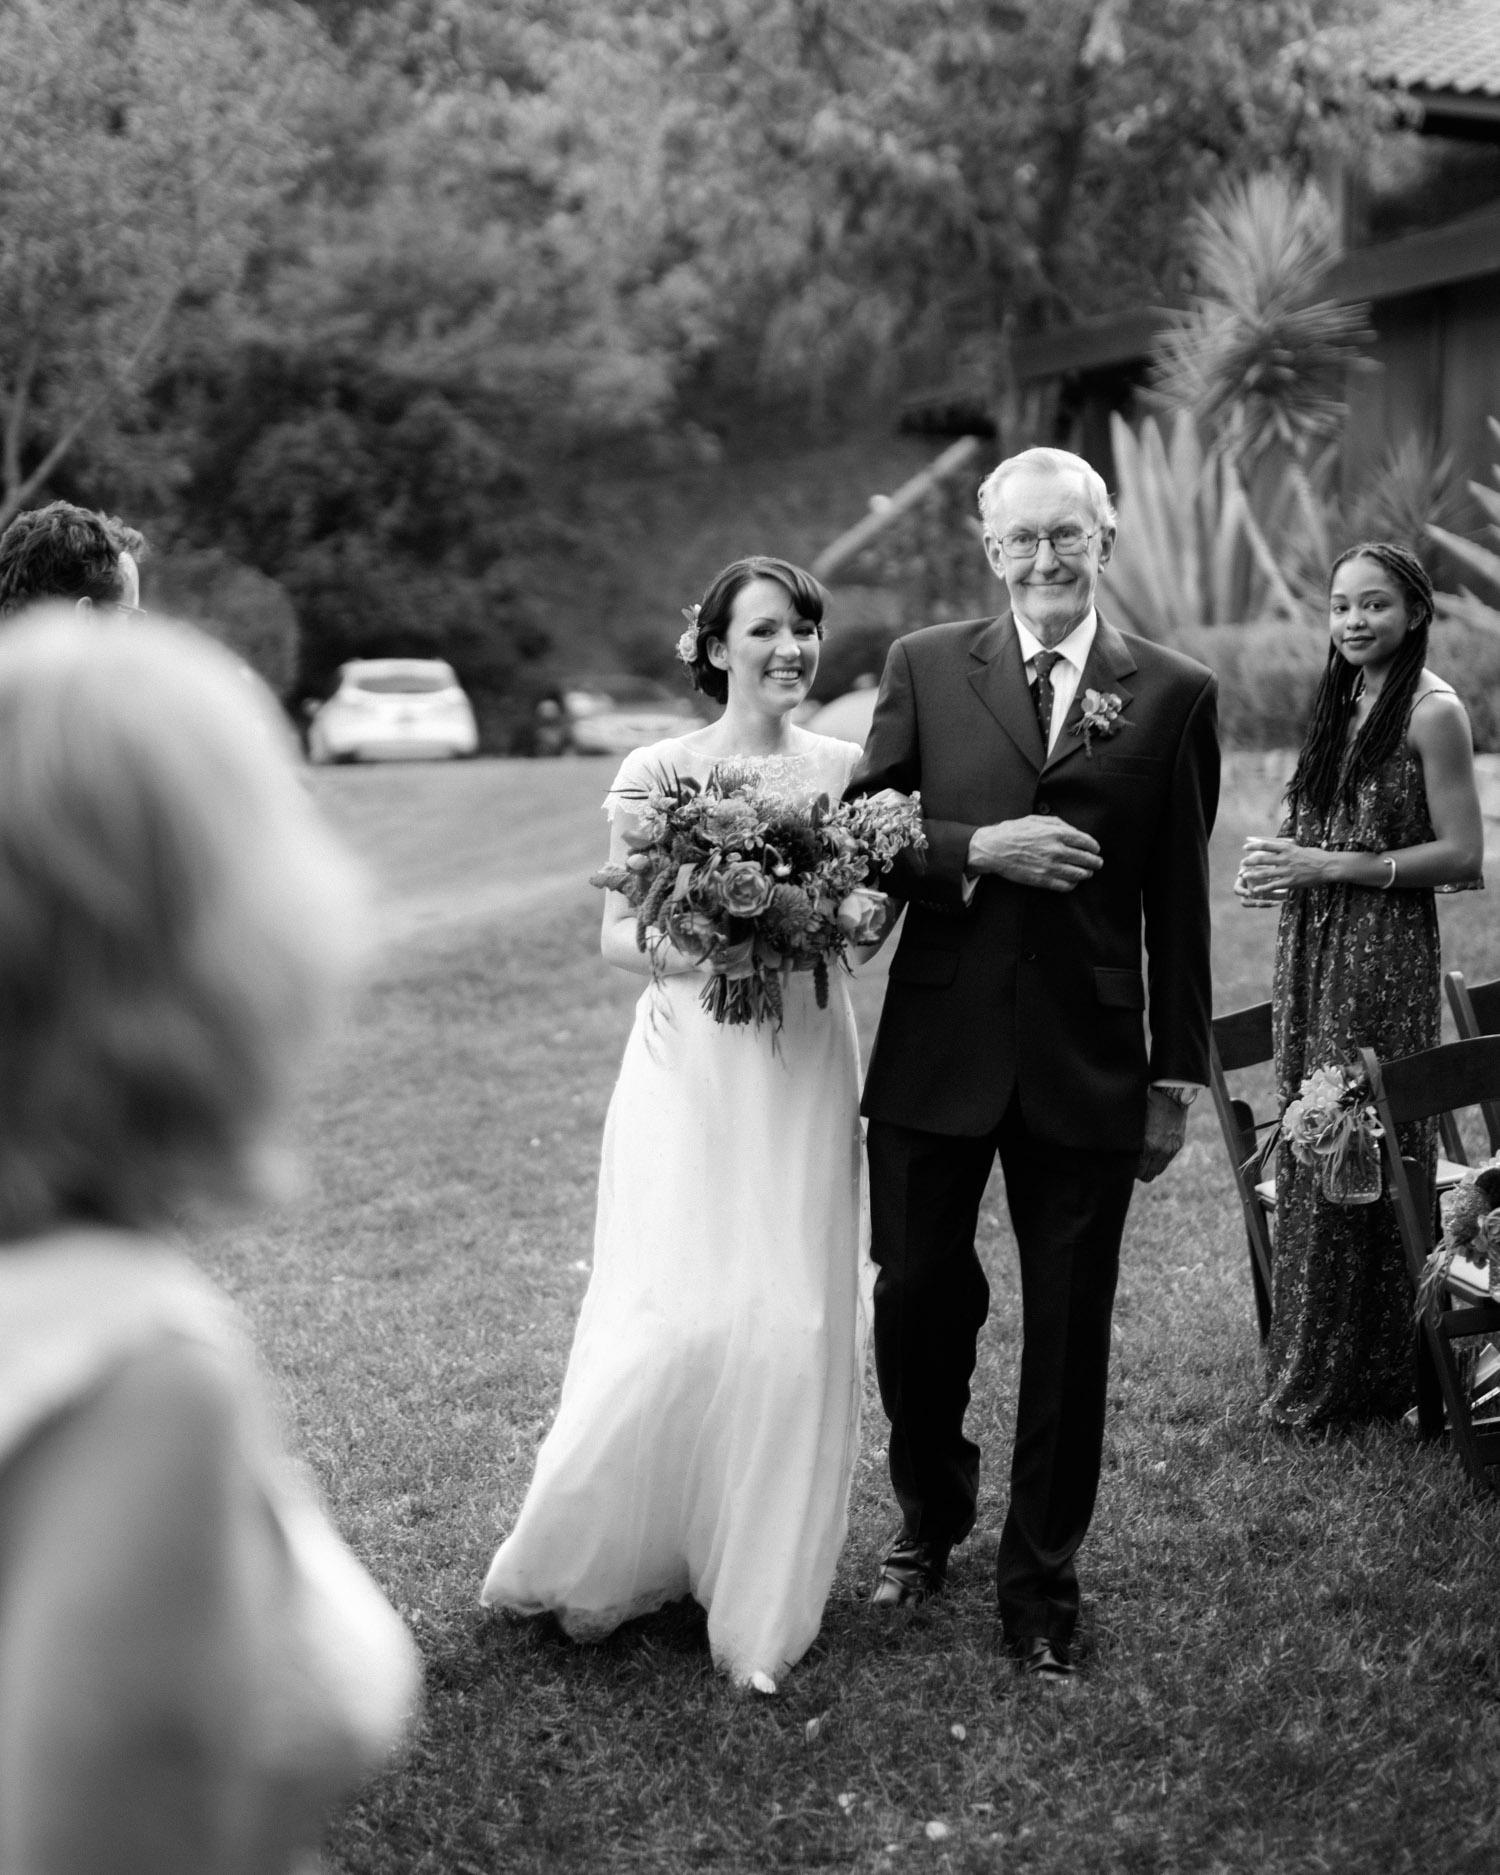 Ojai Wedding Photographer, Calliote Canyon Wedding - The Gathering Season x weareleoandkat 033.JPG